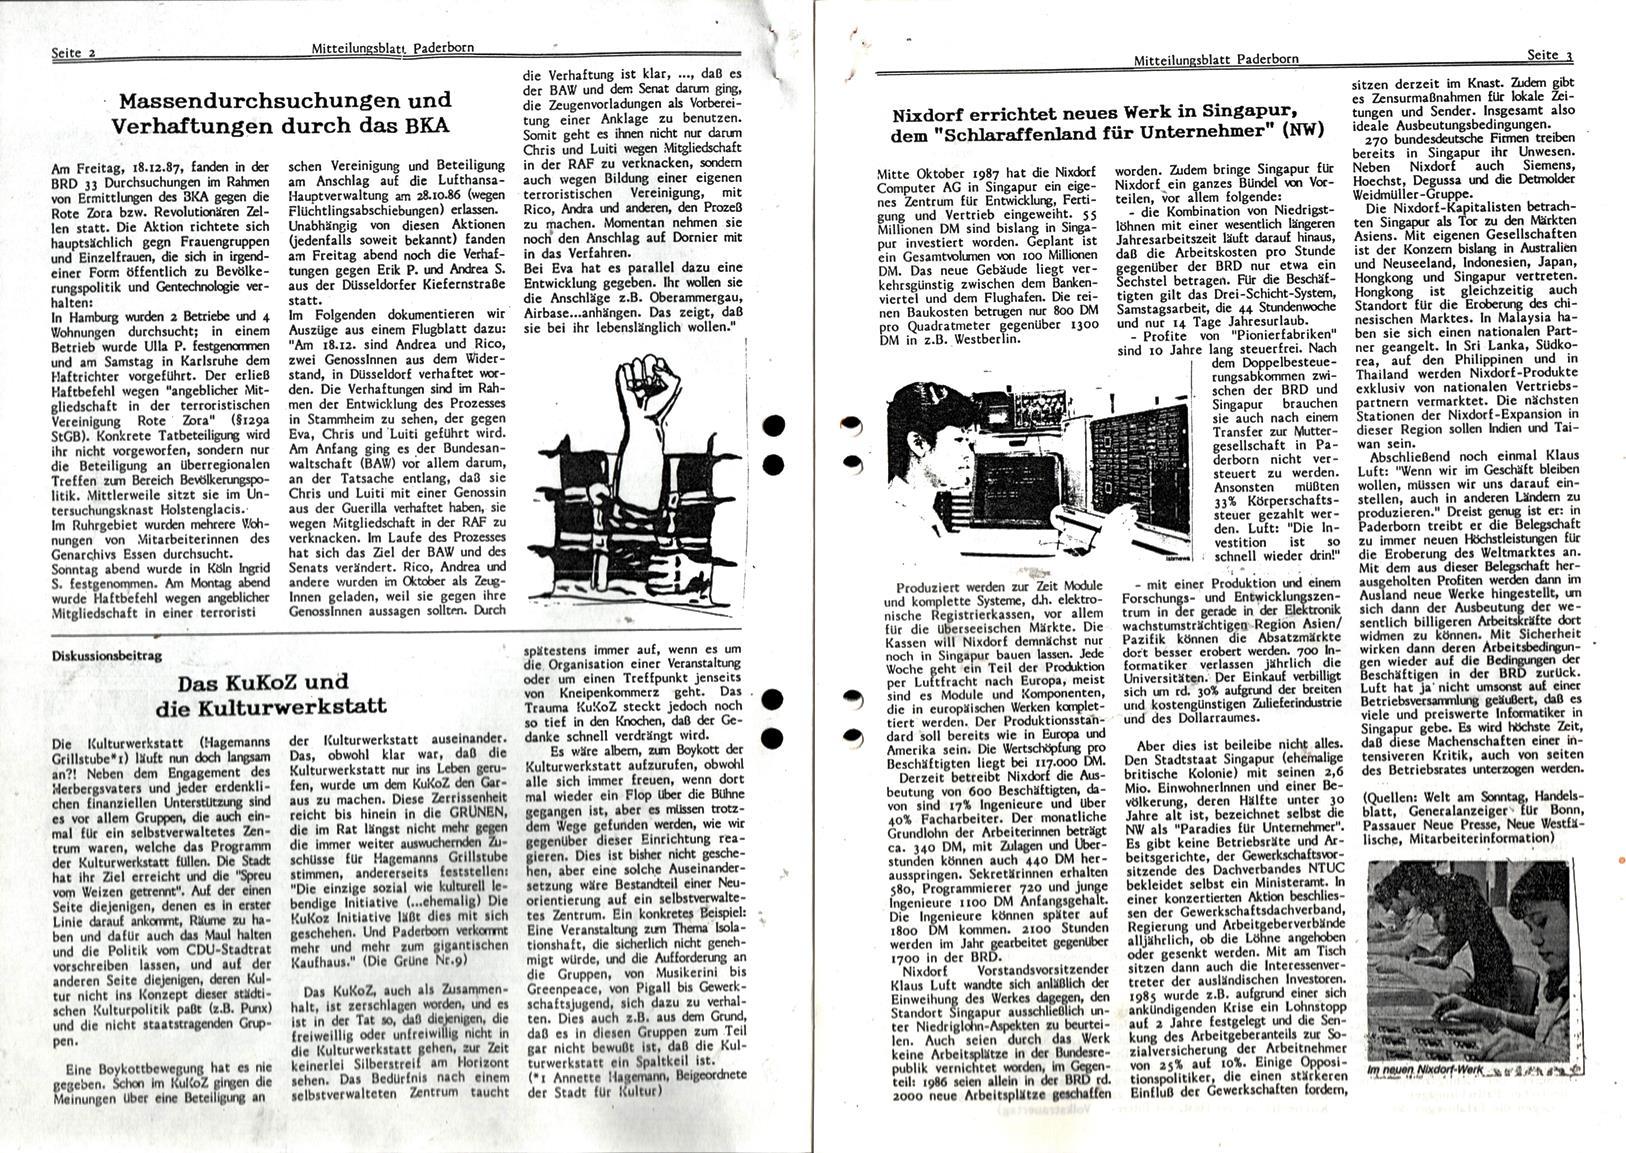 Paderborn_BWK_Mitteilungsblatt_19880124_002